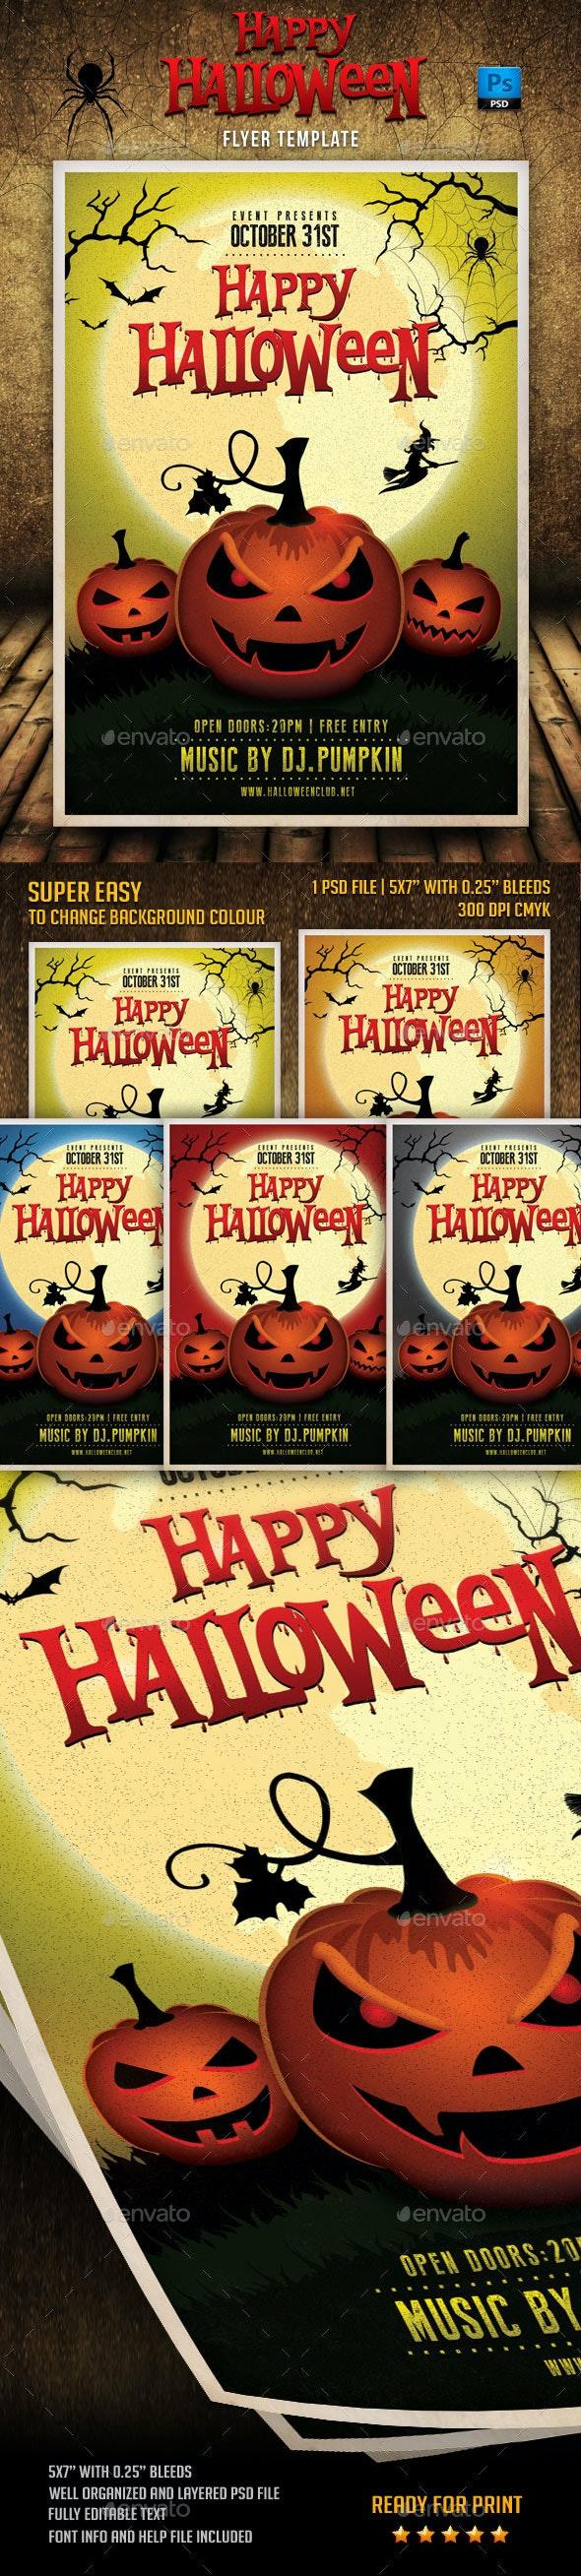 Happy Halloween Flyer Template - Events Flyers